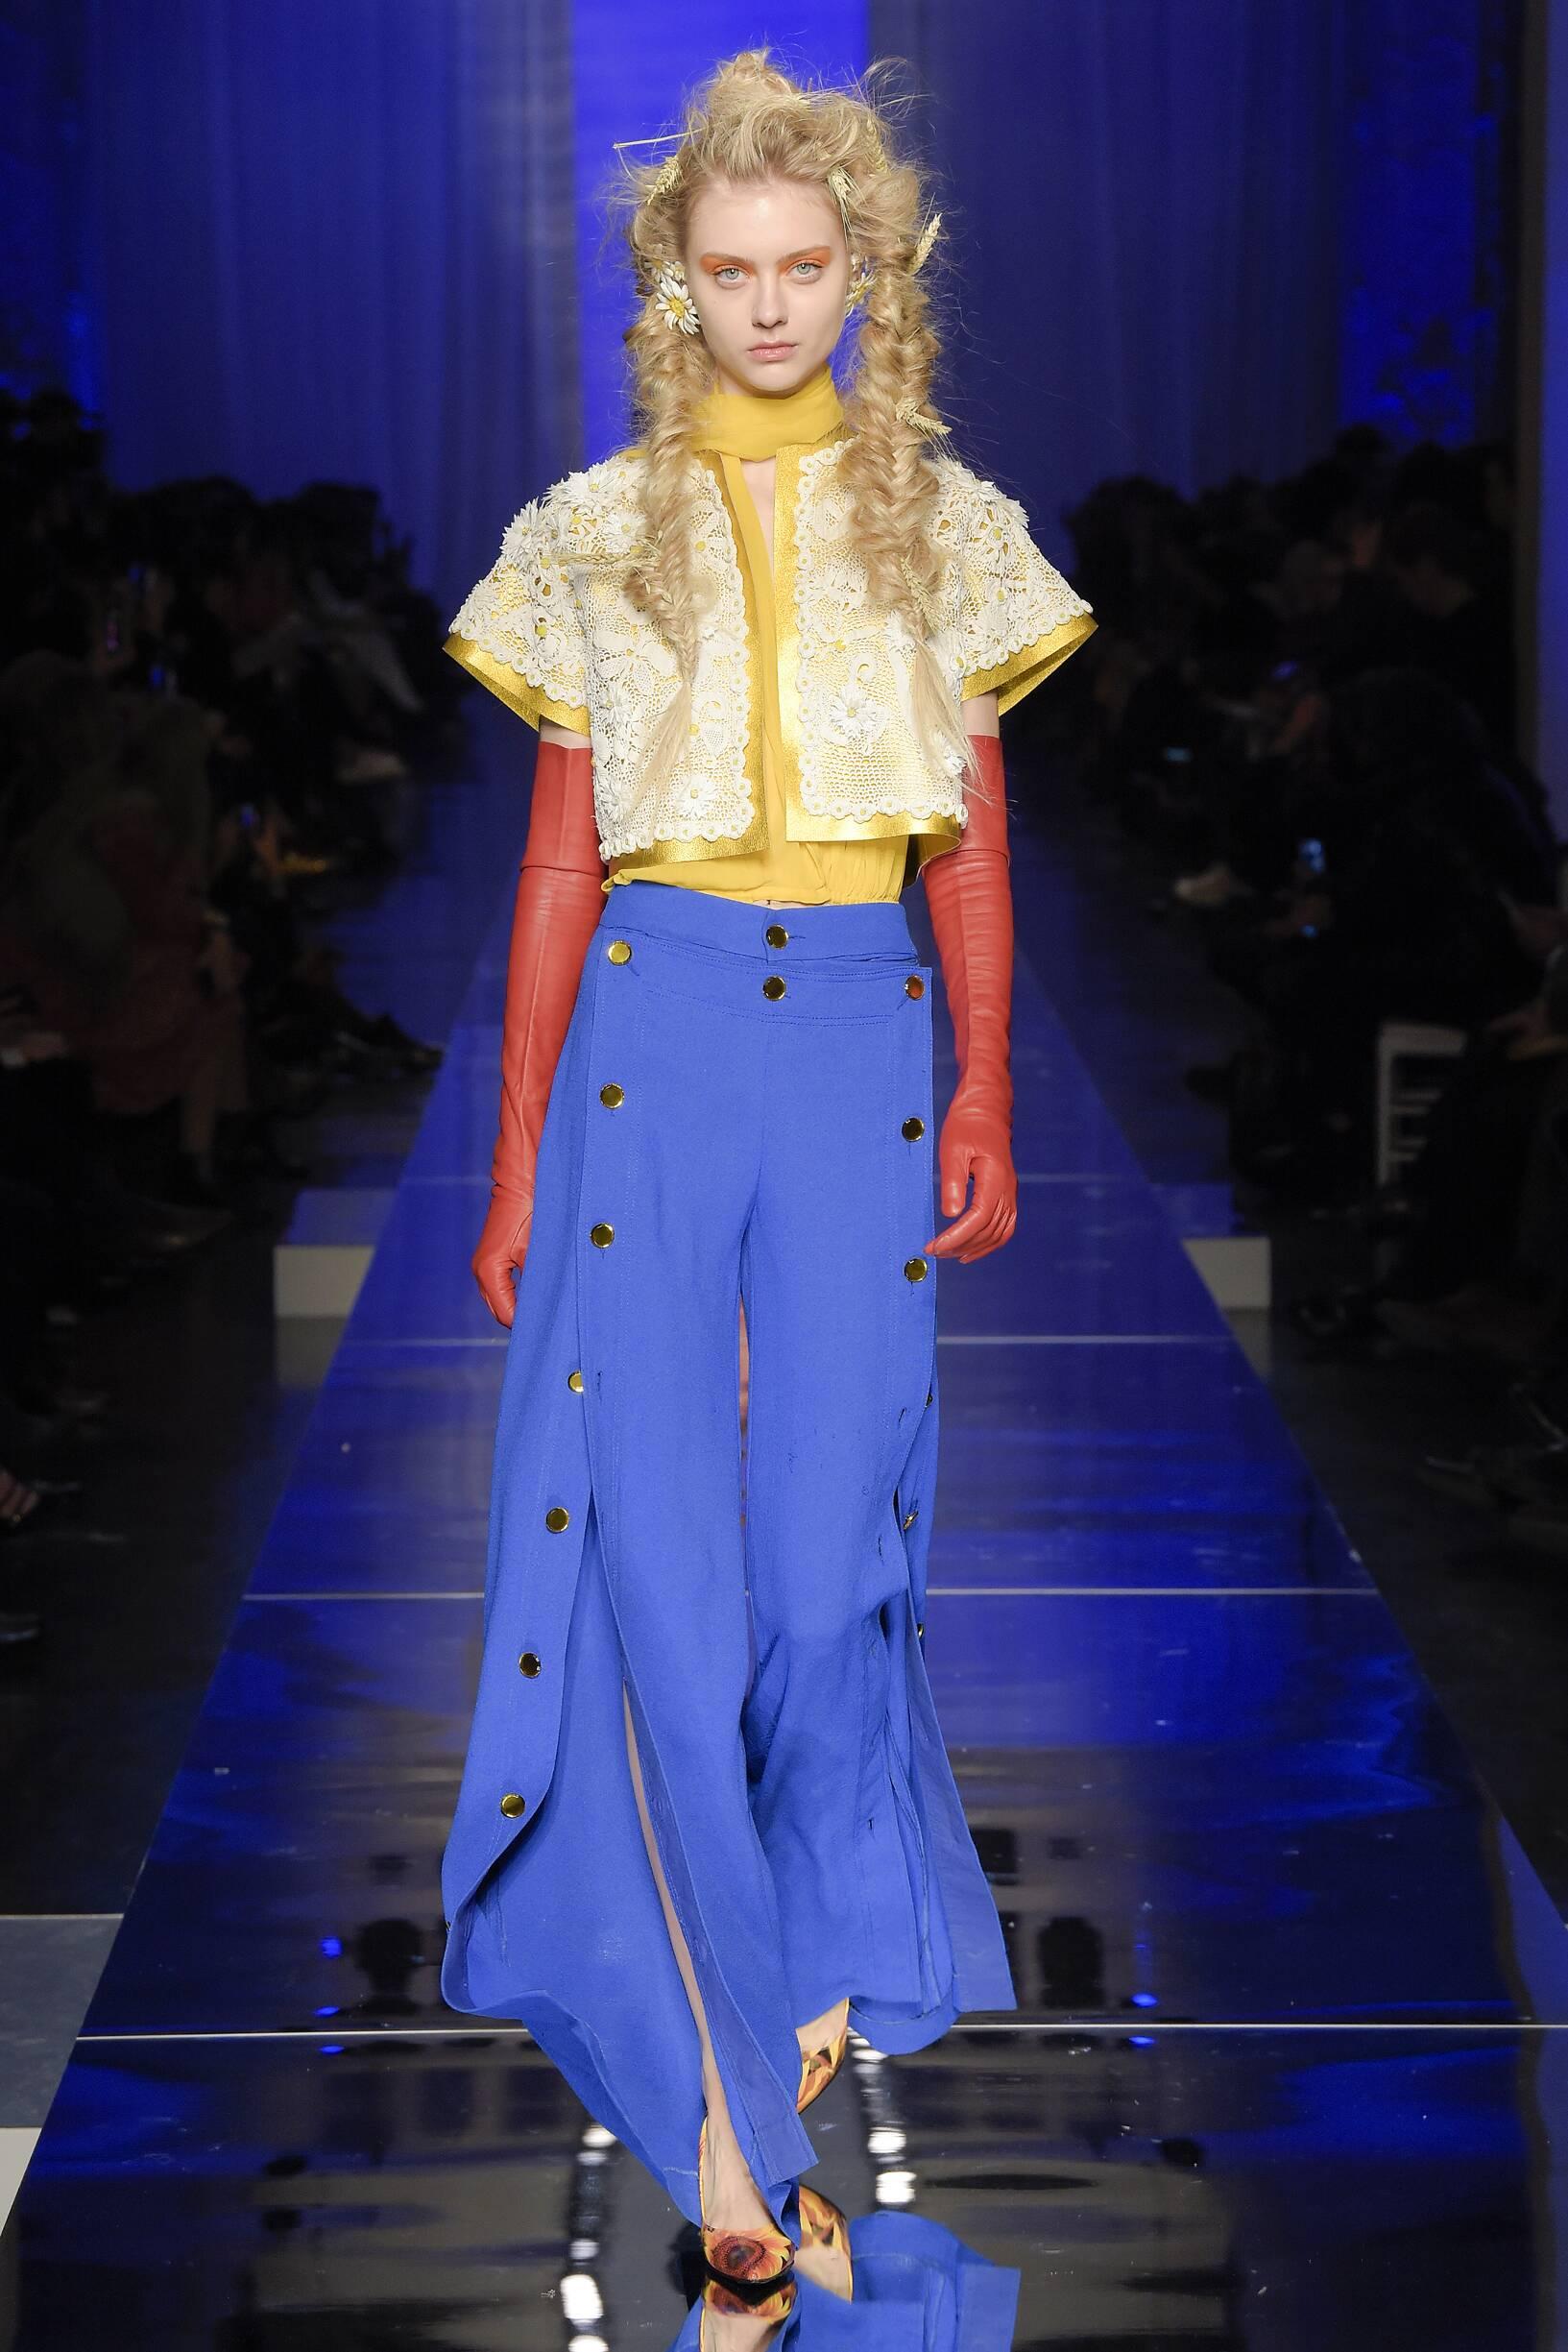 Catwalk Jean Paul Gaultier Haute Couture Woman Fashion Show Summer 2017